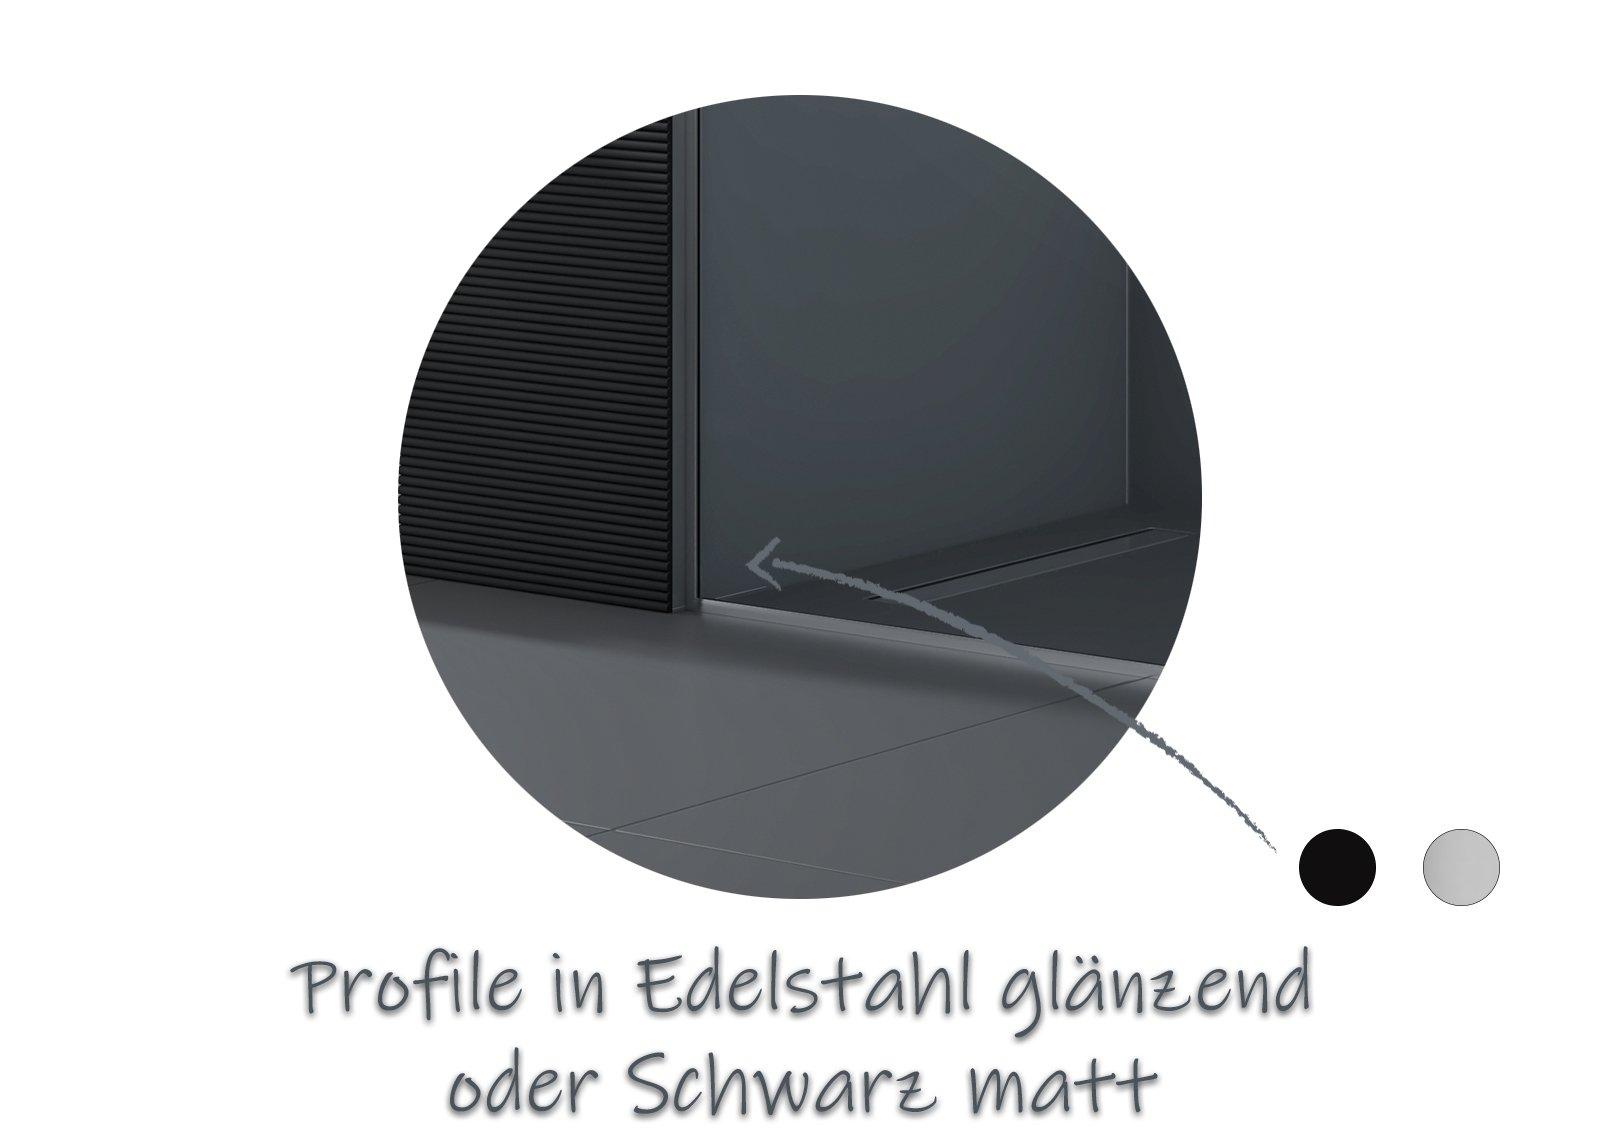 Walk-In 10mm Nano Echtglas EX102 - Klarglas - 2 Glaswände & 14mm Edelstahlprofil - Profilfarbe & Breite wählbar zoom thumbnail 5